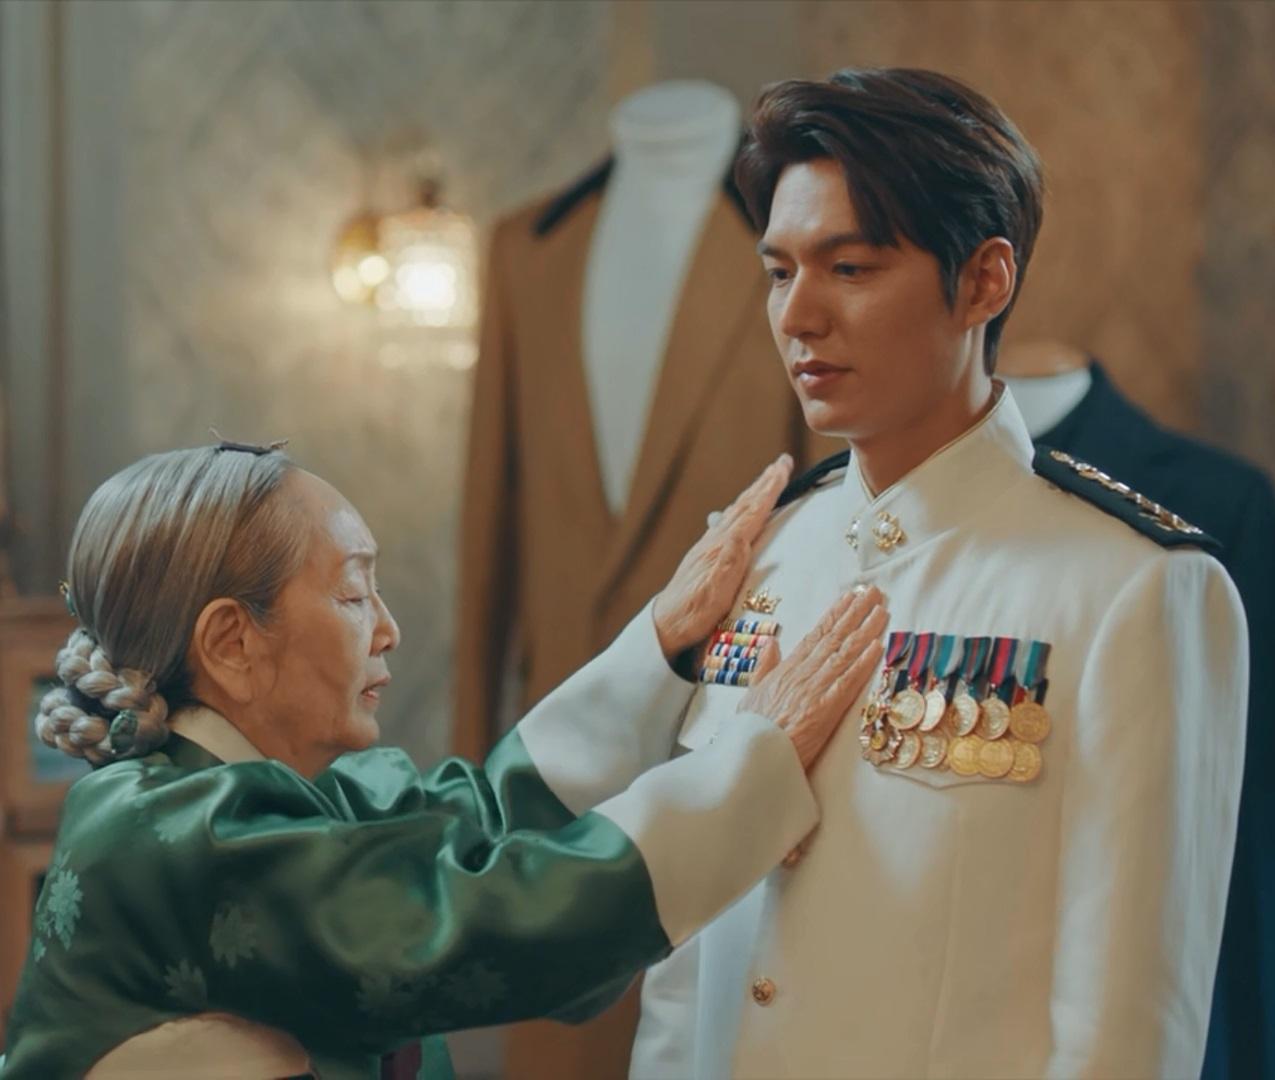 Lee Min Ho in The King: Eternal Monarch Korean Drama (2020) نقد و بررسی سریال کره ای پادشاه: سلطنت ابدی (The King: Eternal Monarch)